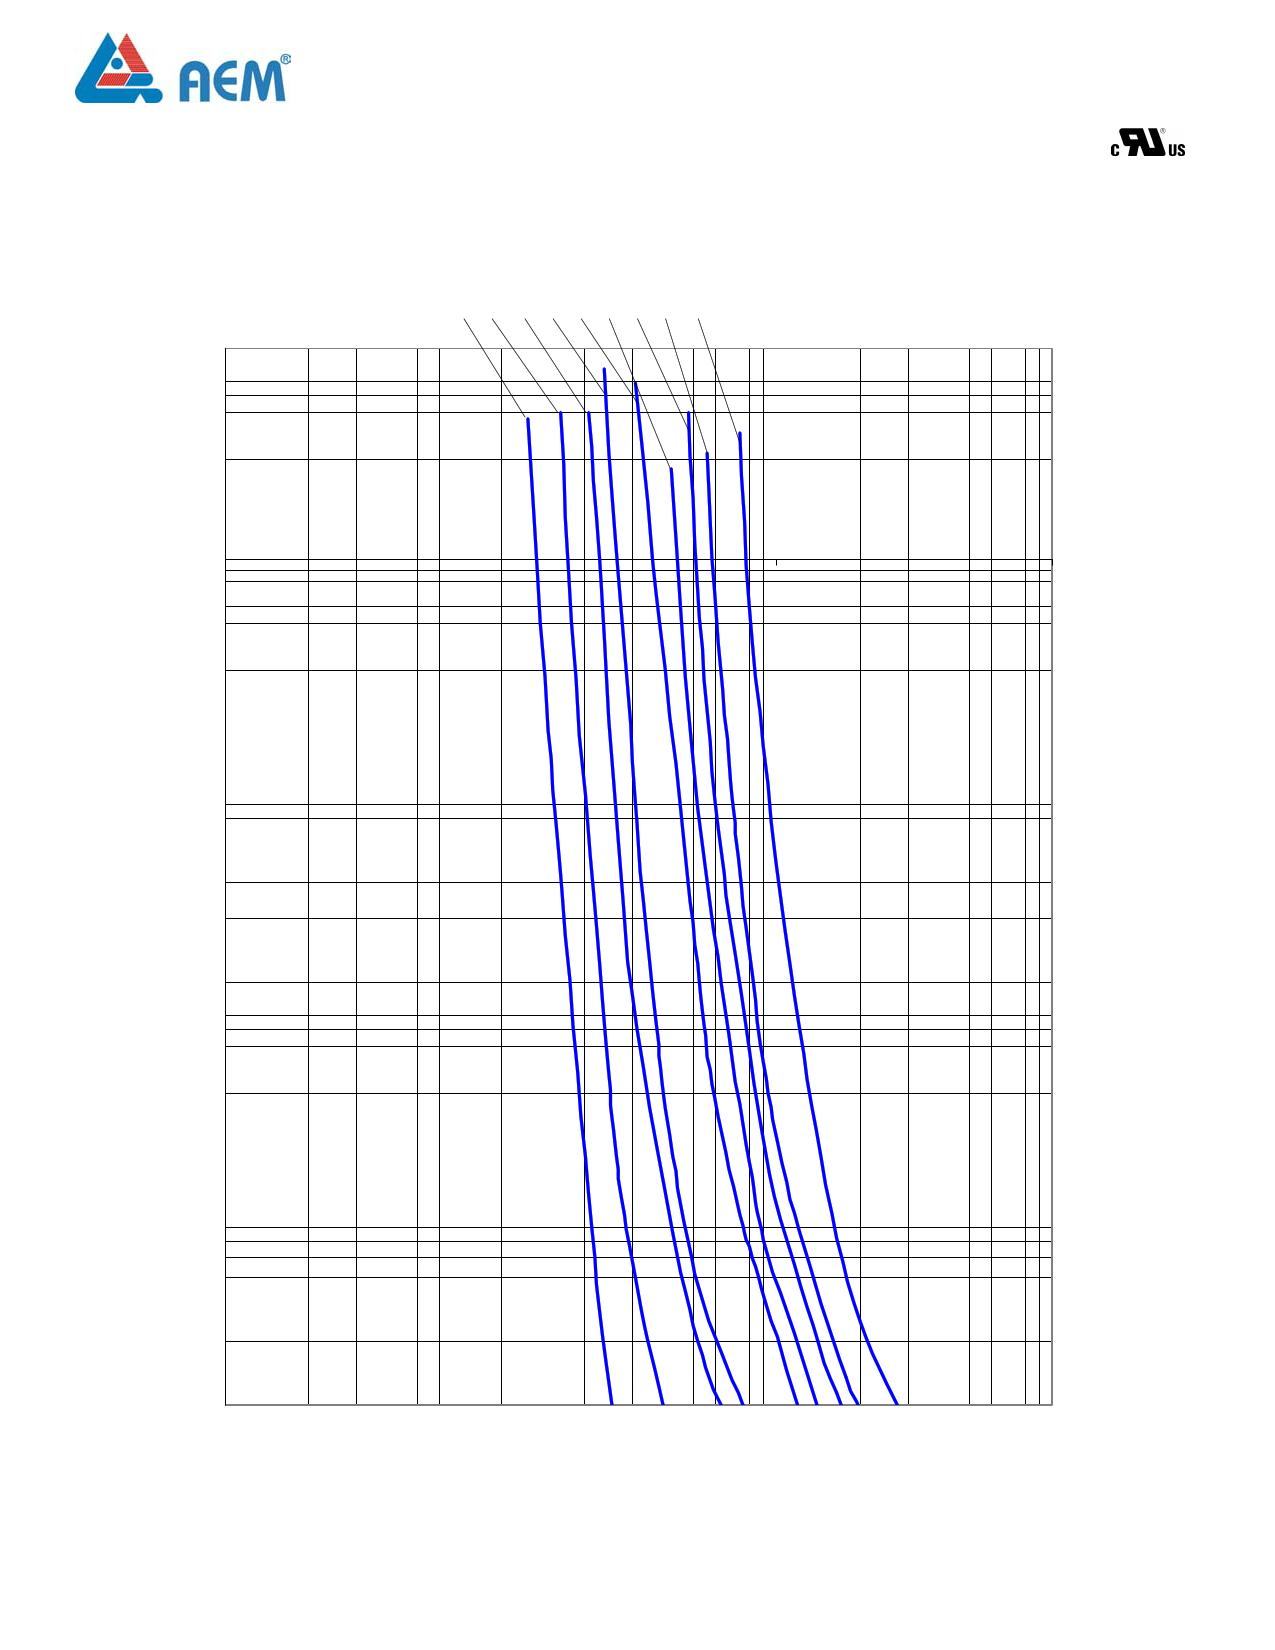 F0603FF1500V032T arduino